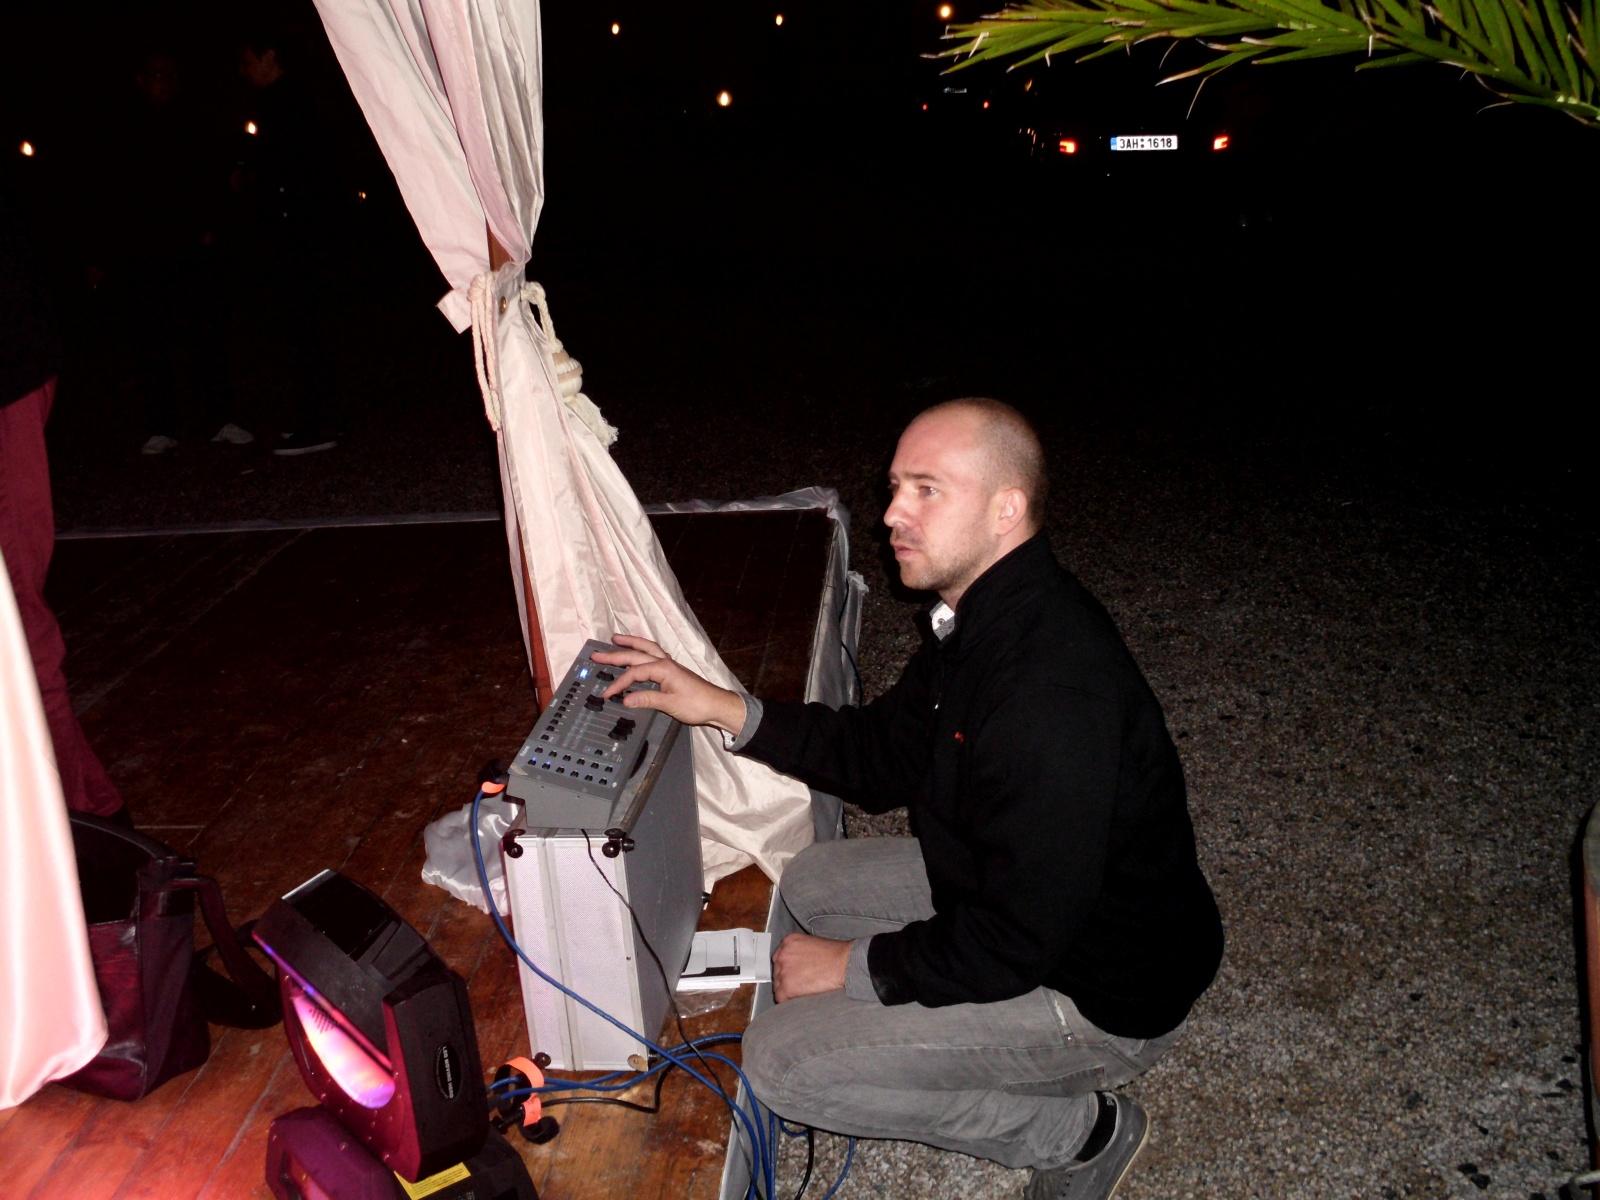 Zamek-Troja-A-TechService_Technicke-zajisteni-svatby-Marek-Stengl-2014